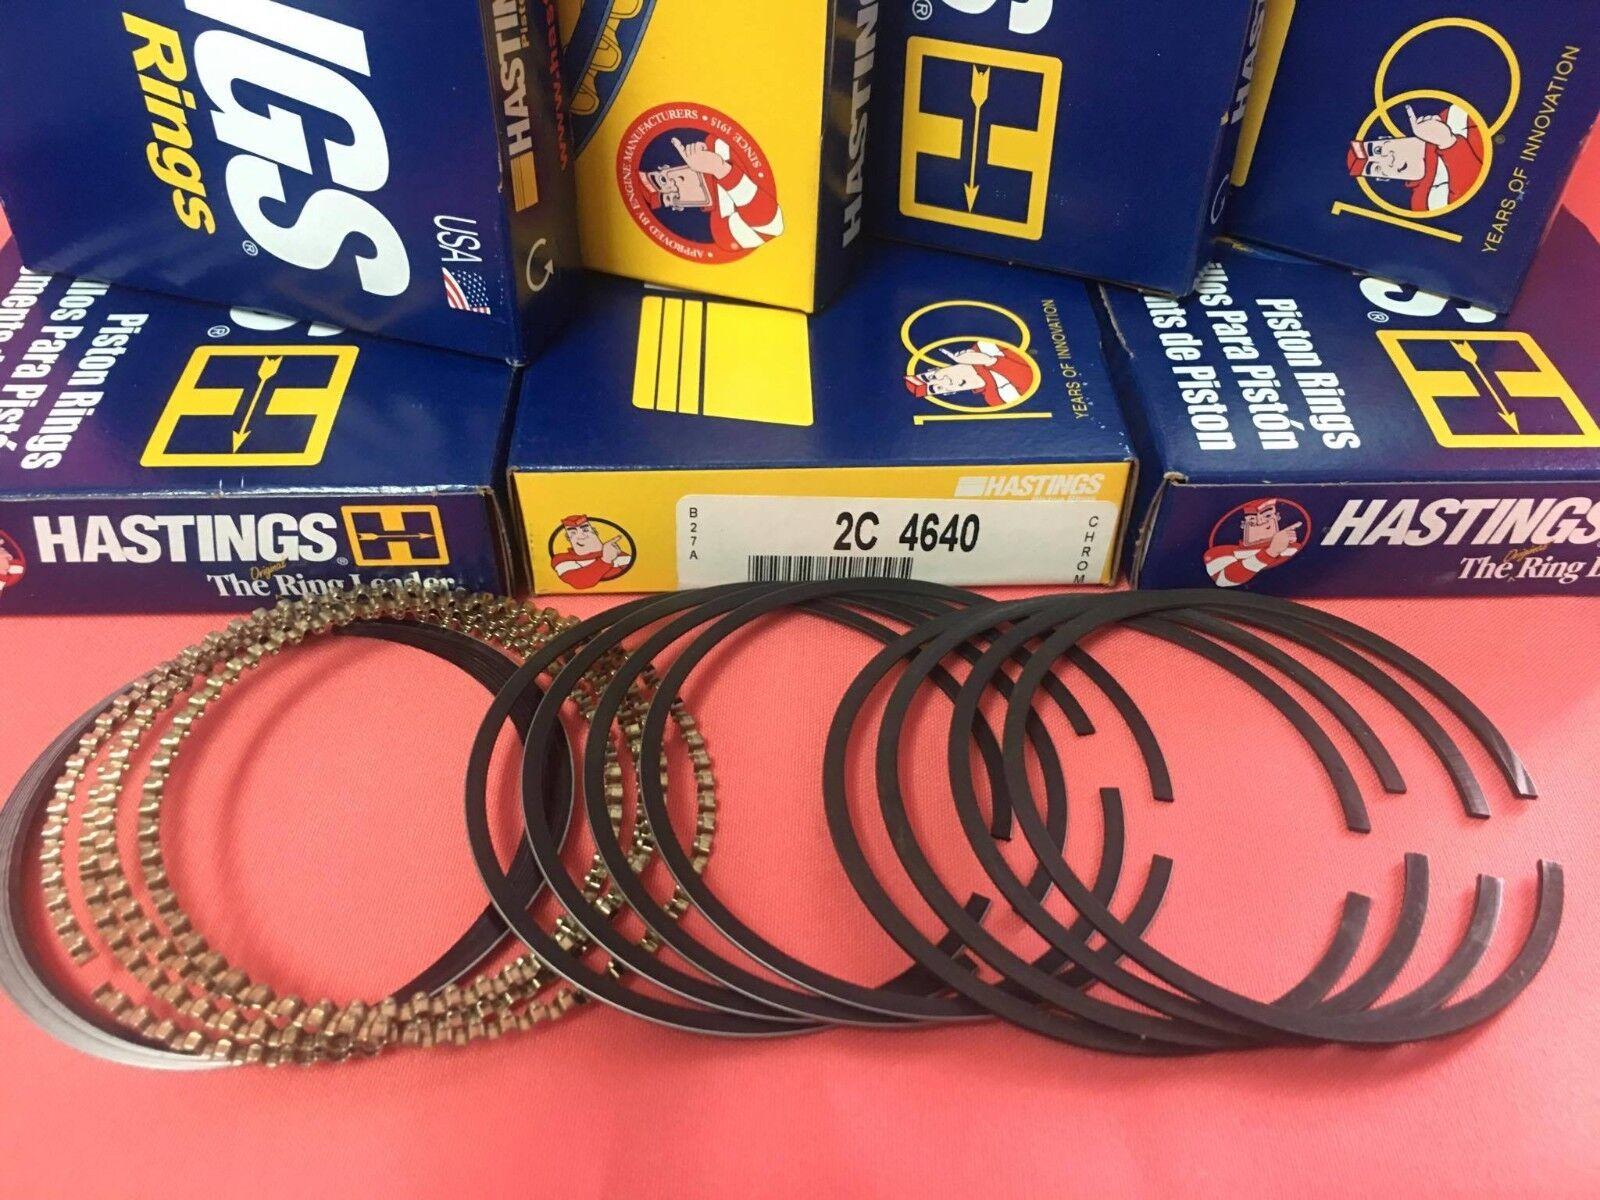 Hastings 4414S020 Single Cylinder Piston Ring Set